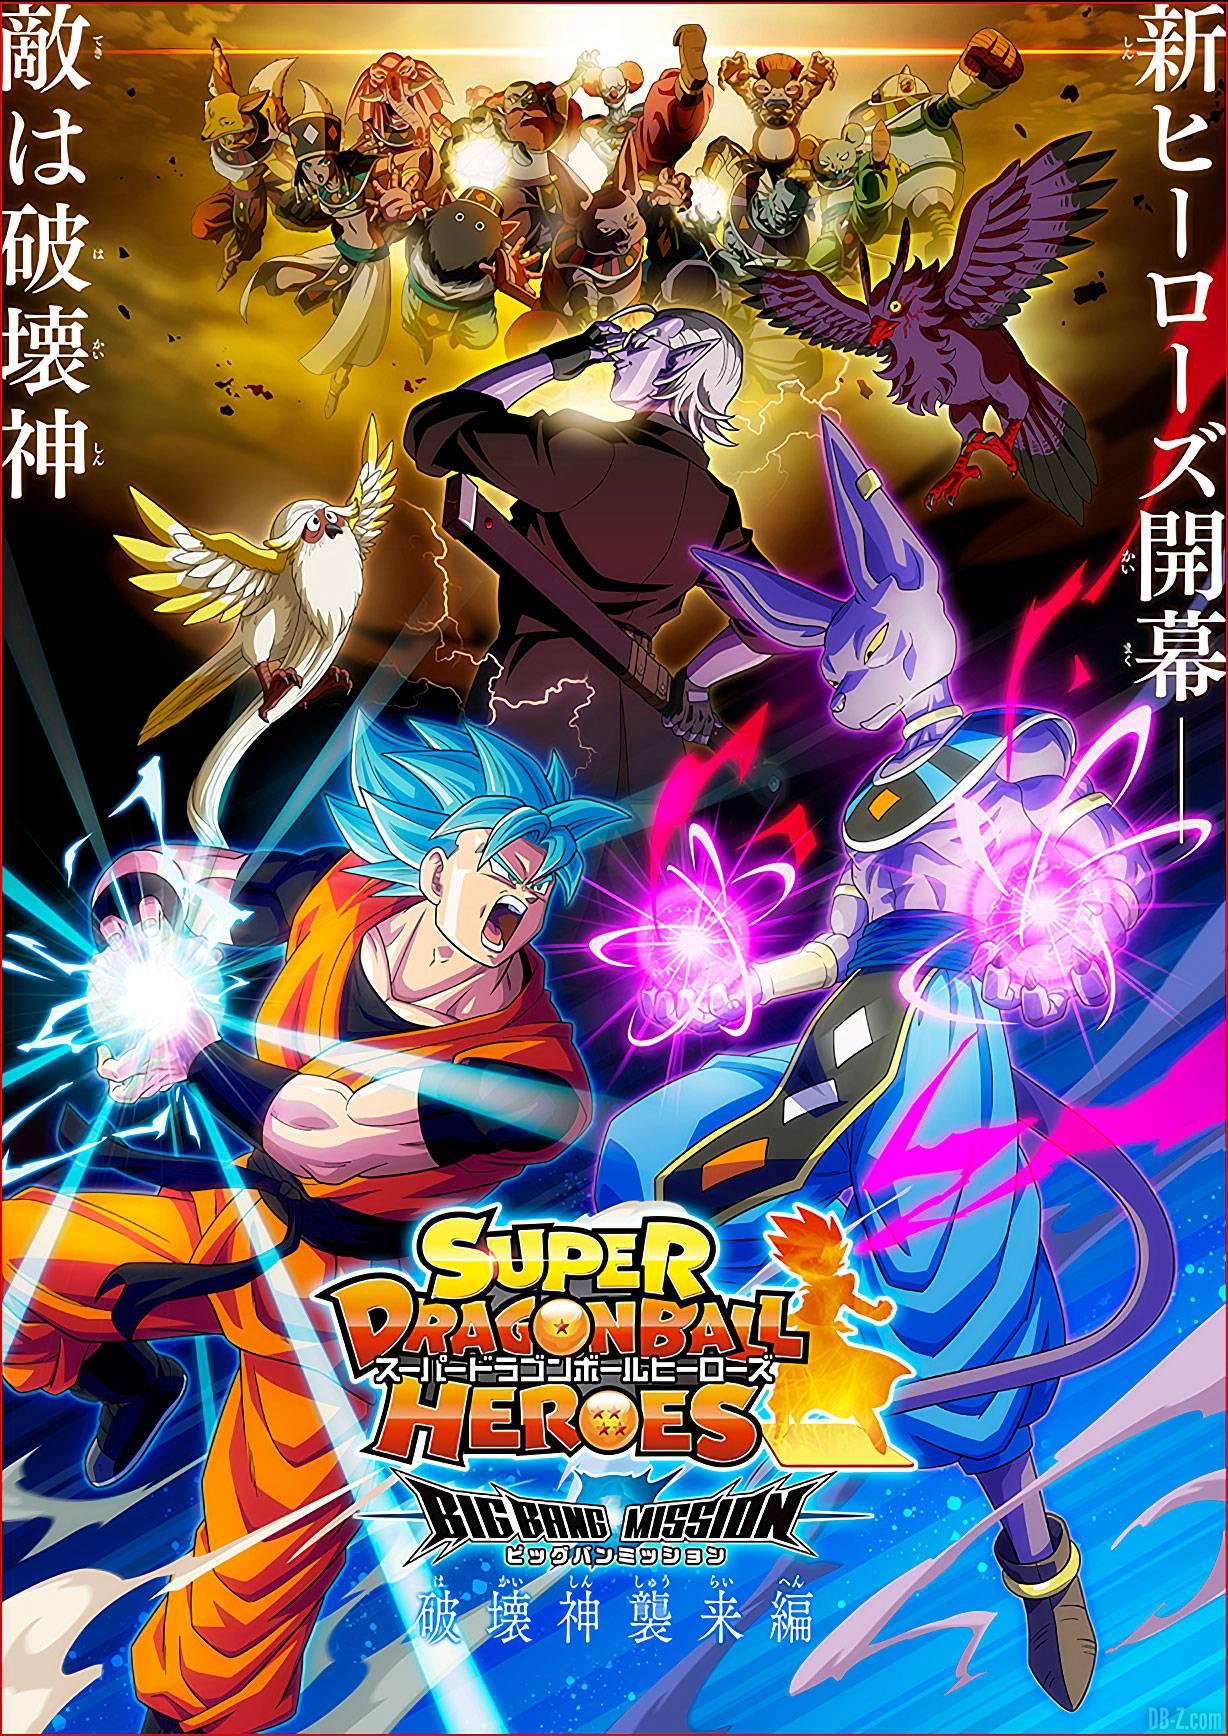 Super Dragon Ball Heroes: Big Bang Mission Episode 9 English Subbed